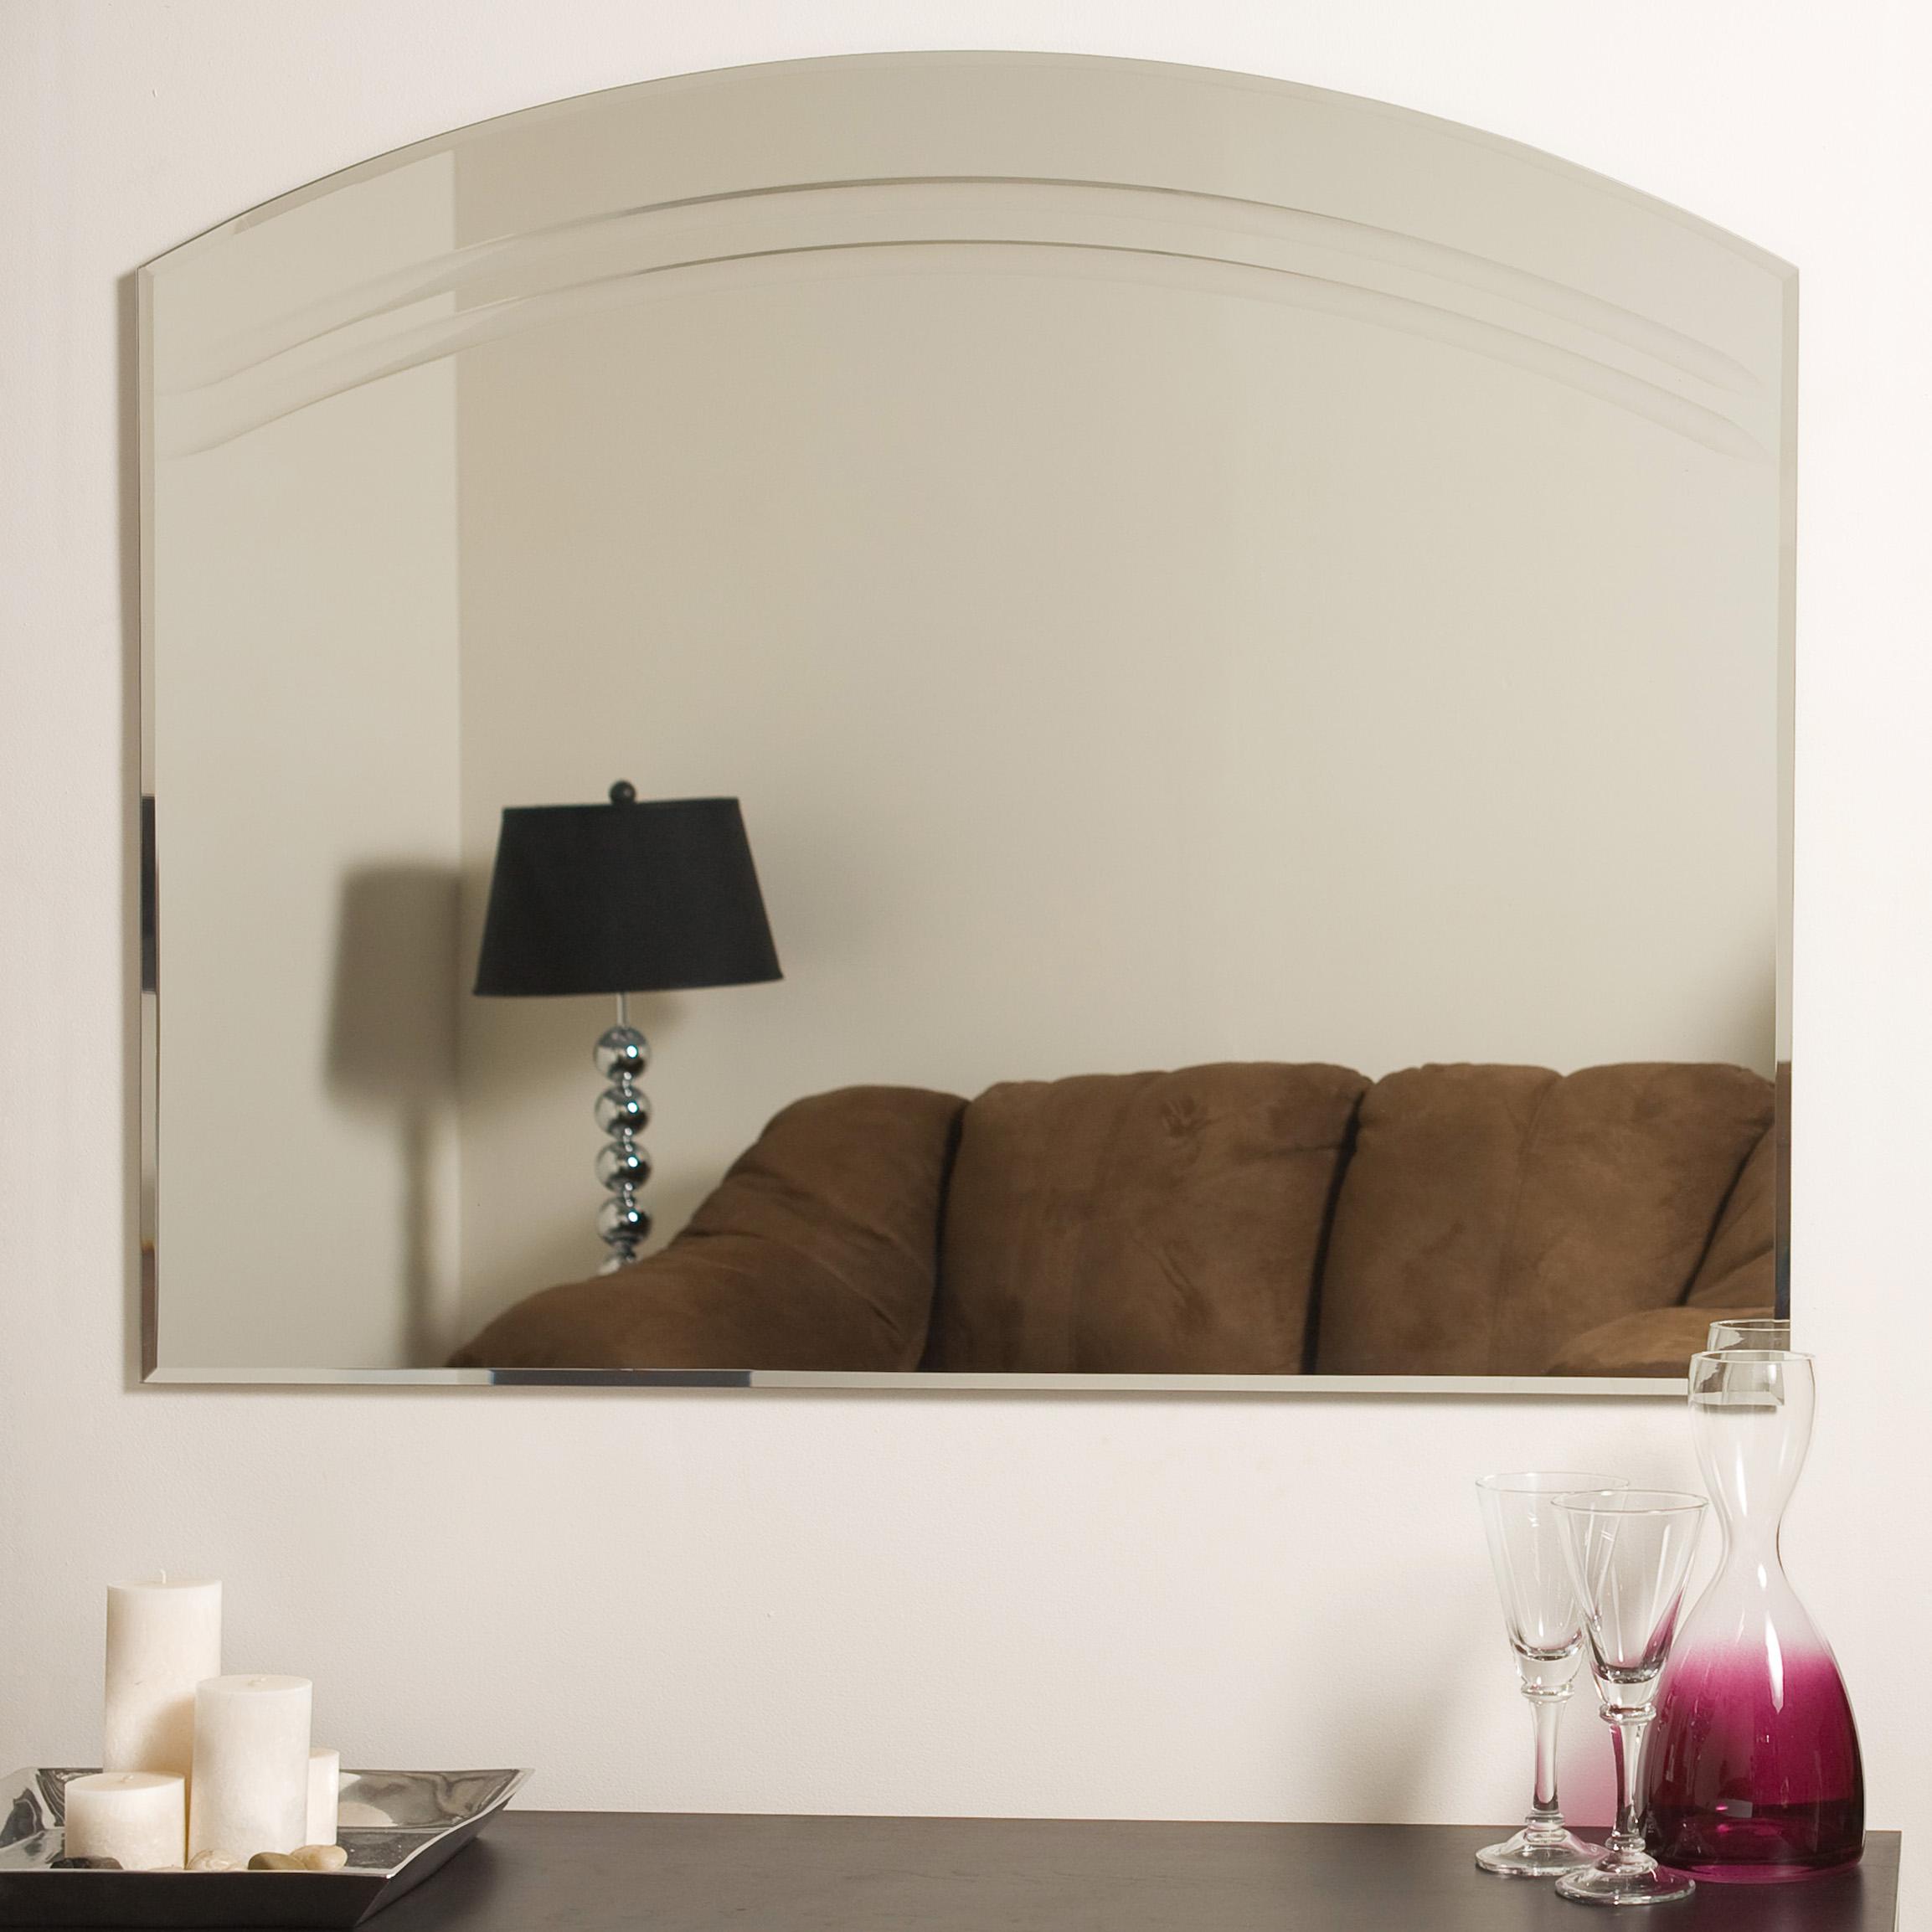 Angel Large Frameless Wall Mirror - Walmart.com